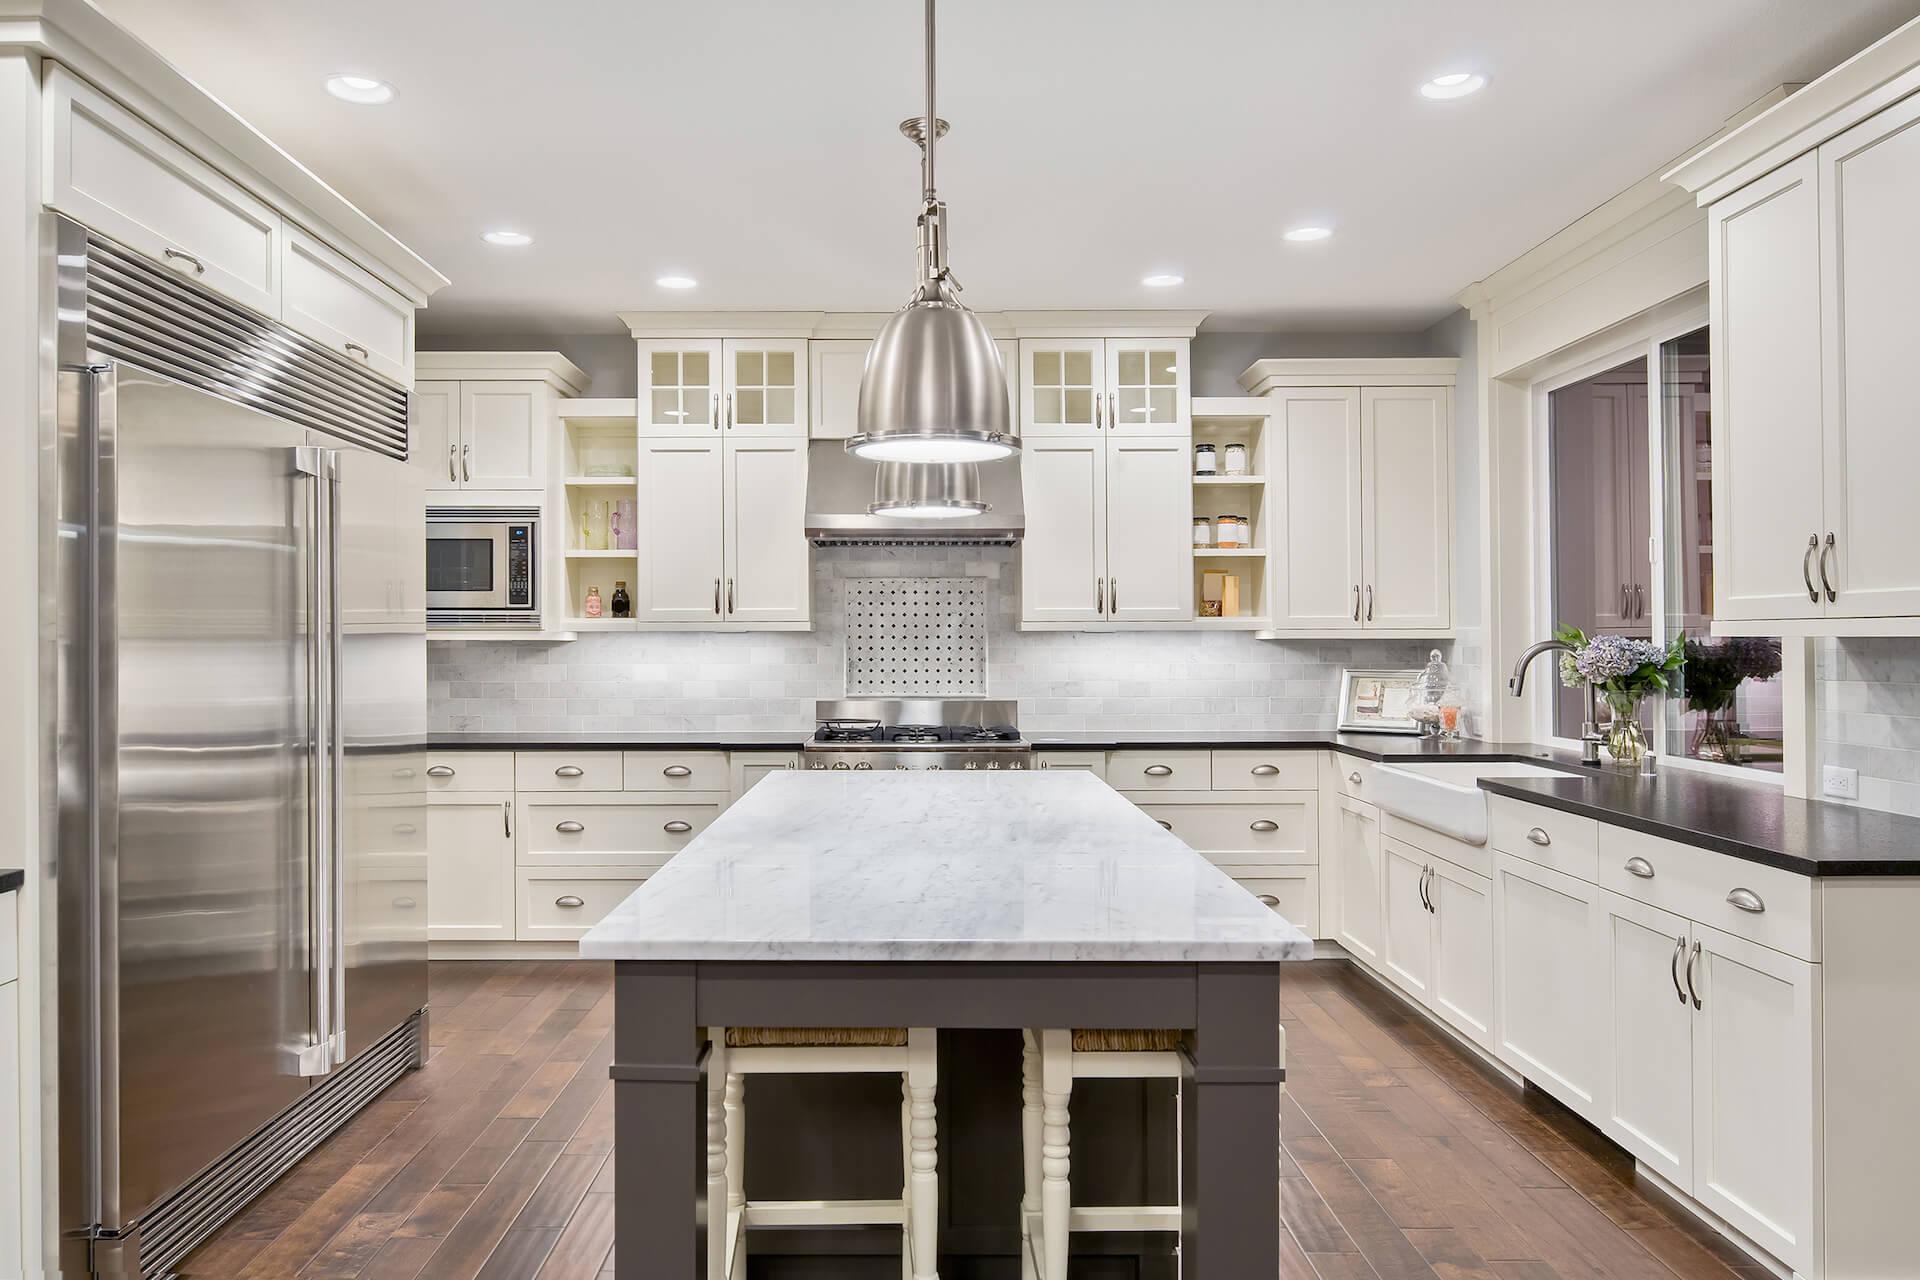 kitchen after cabinet refinishing salt lake city ut